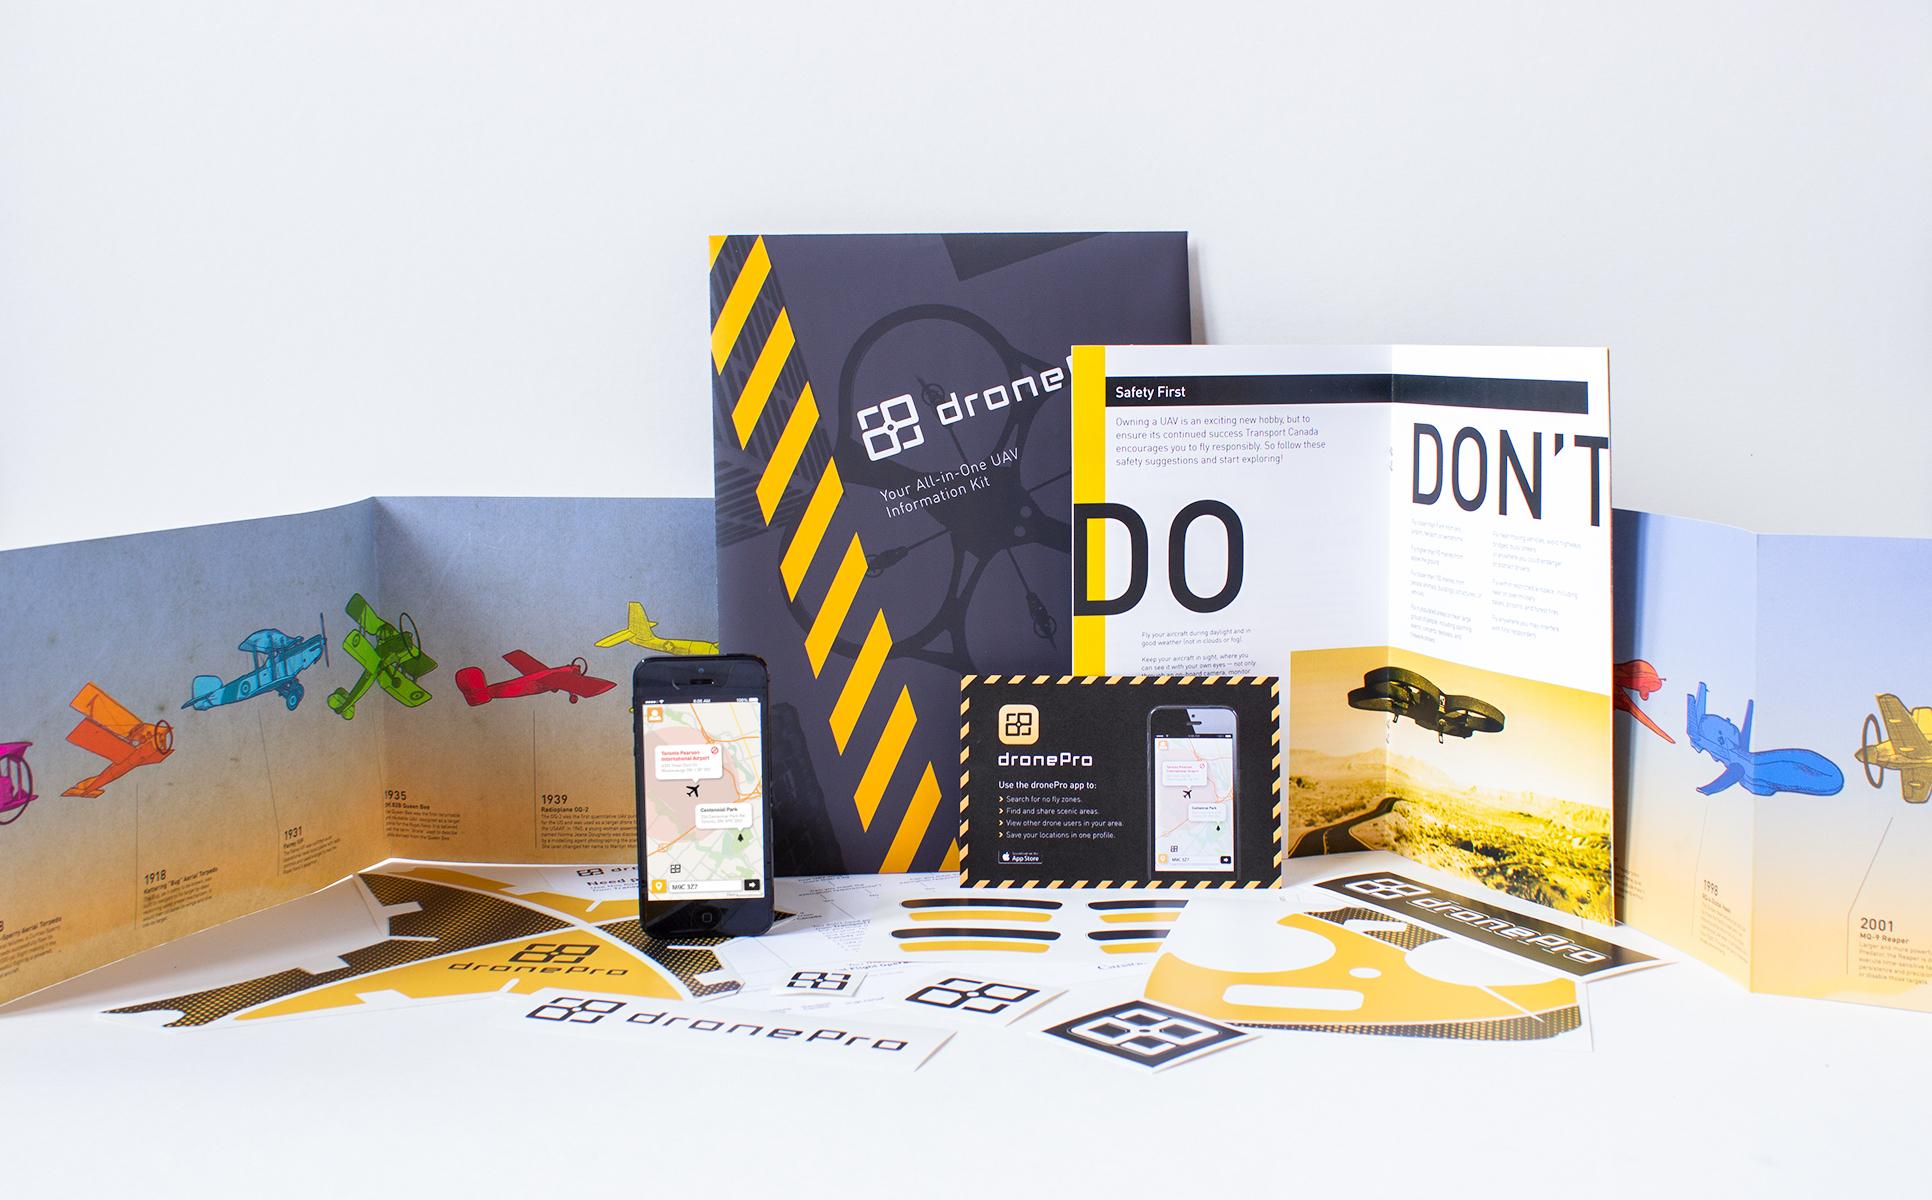 drone pro kit